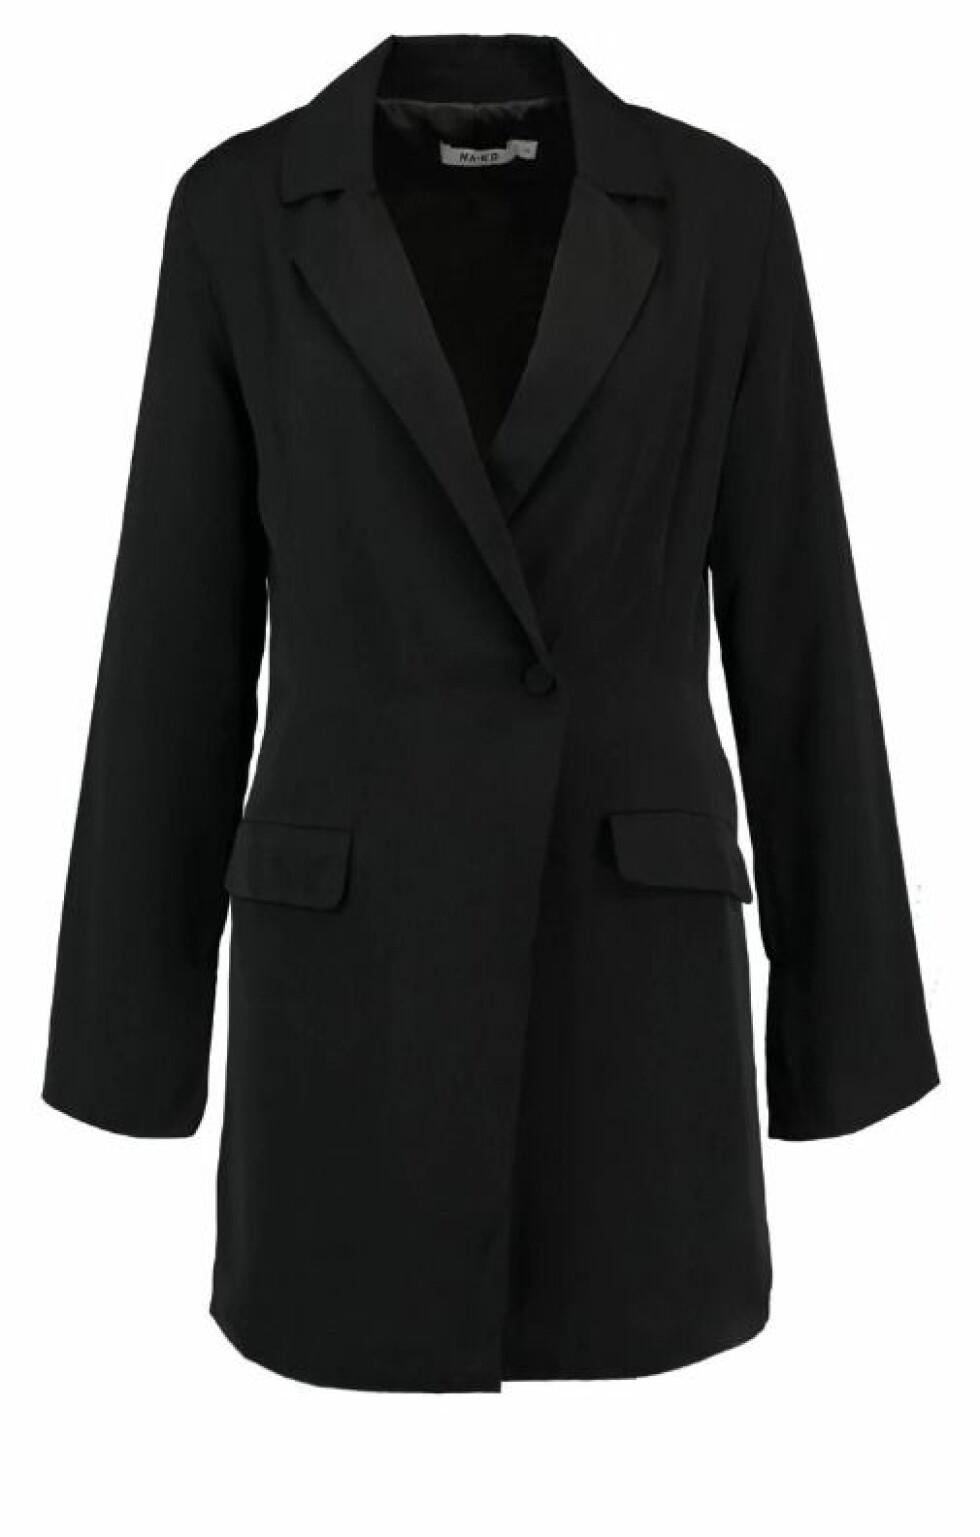 NA-KD |539,-| https://www.zalando.no/na-kd-blazer-dress-dressjakke-black-naa21c021-q11.html